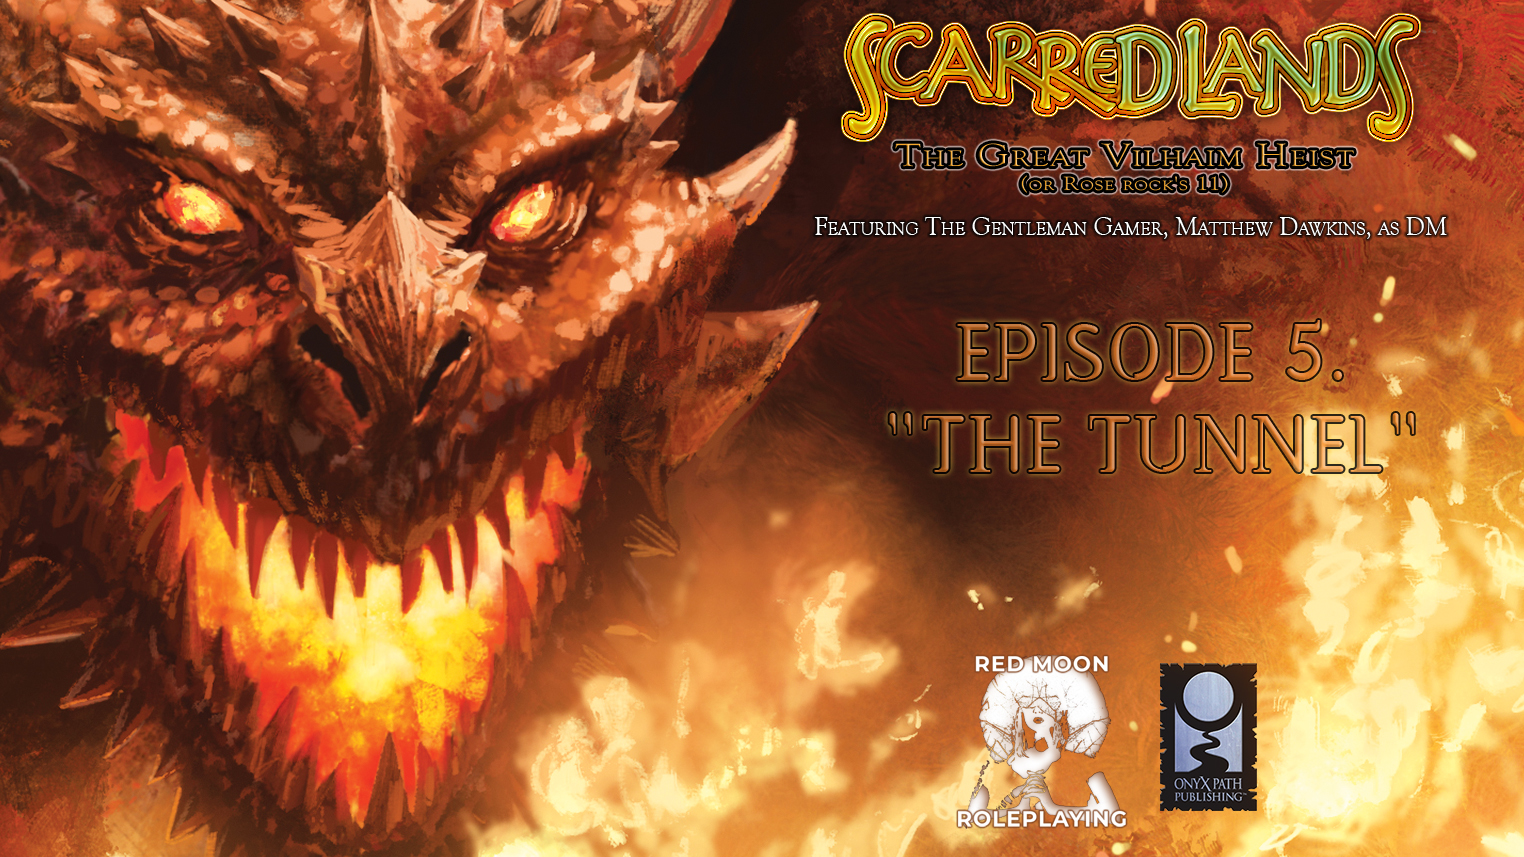 SCARRED_05.jpg